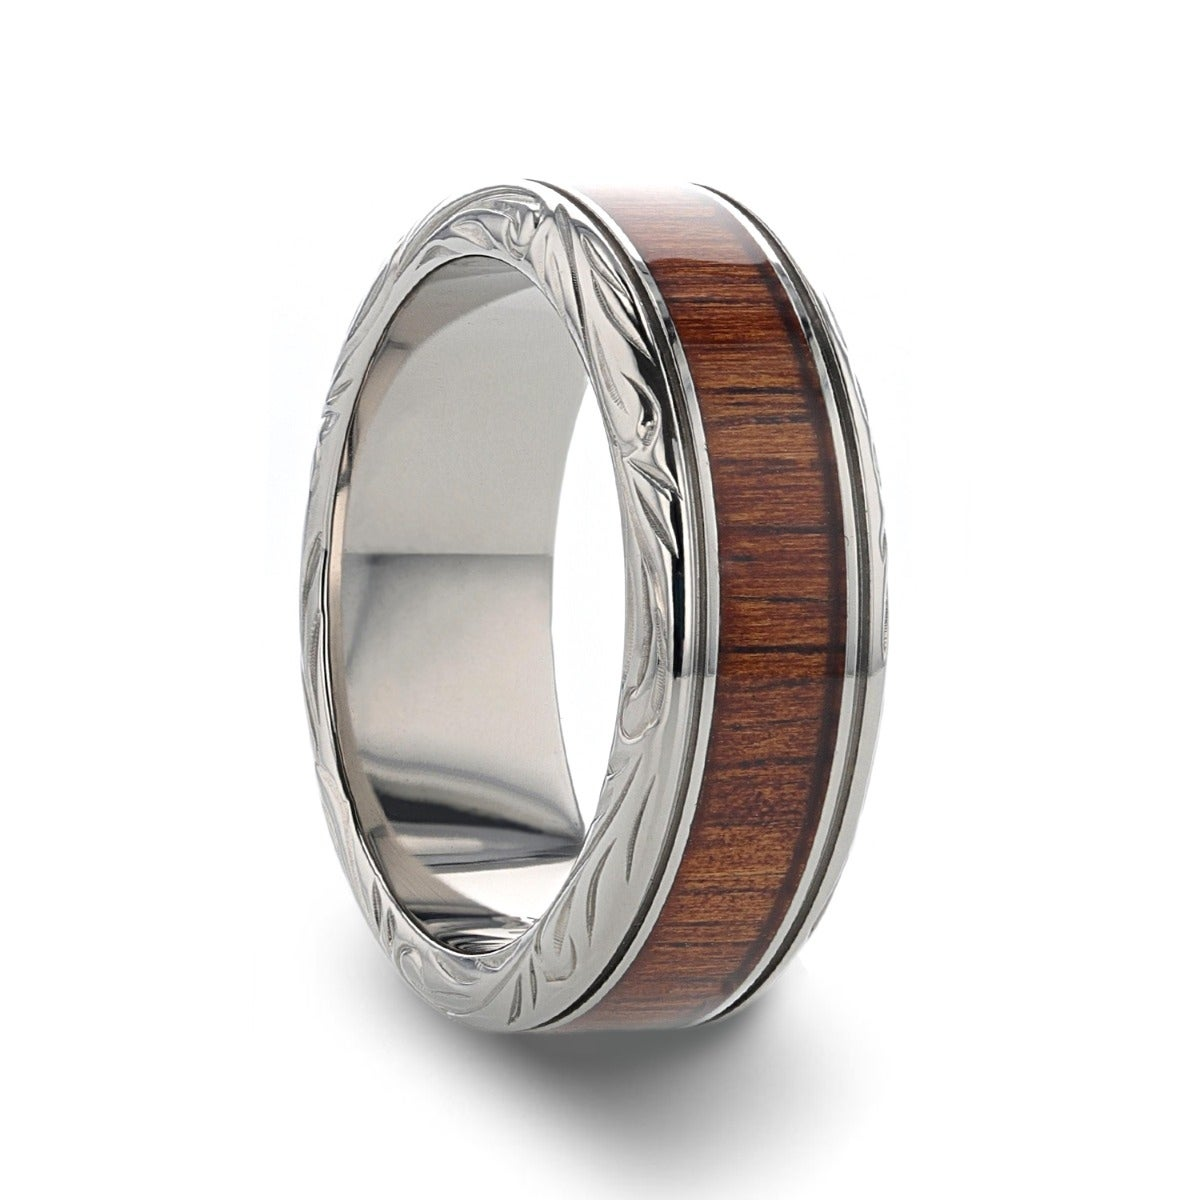 Comfort Fit Titanium Rings for Men Thorsten Kony 8 mm Lightweight Titanium Black Titanium Polished Beveled Edges Black Walnut Wood Inlaid Men/'s Wedding Ring